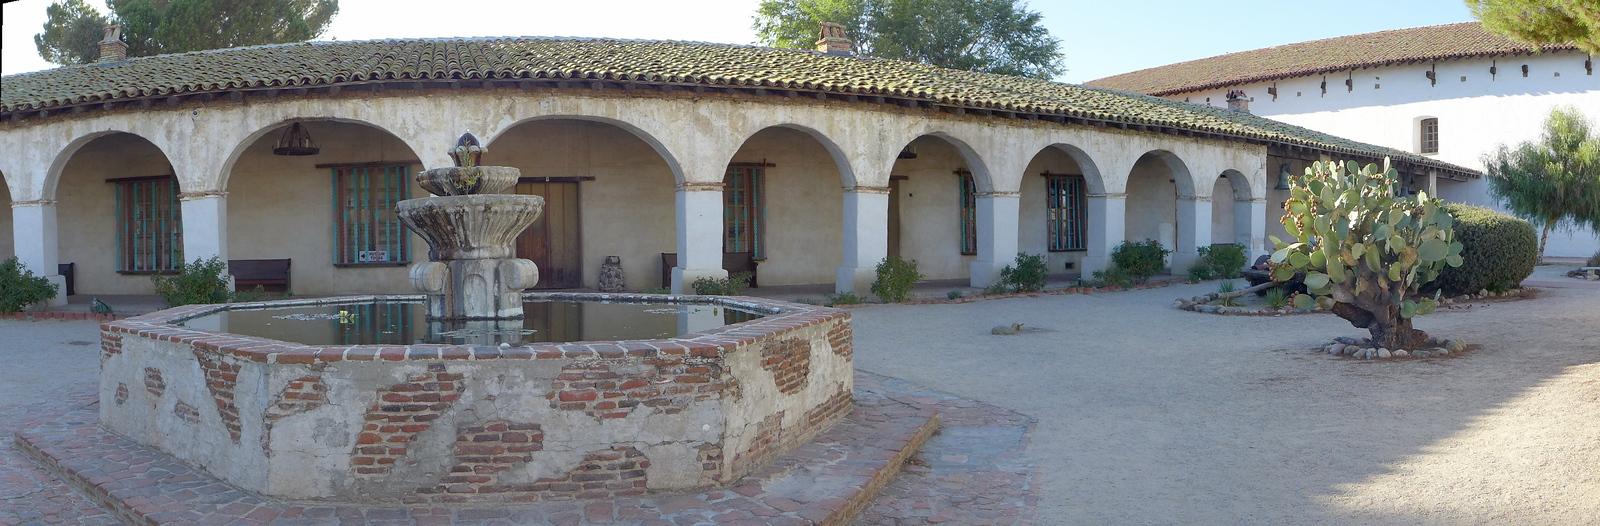 San Miguel Mission, California, 2014.